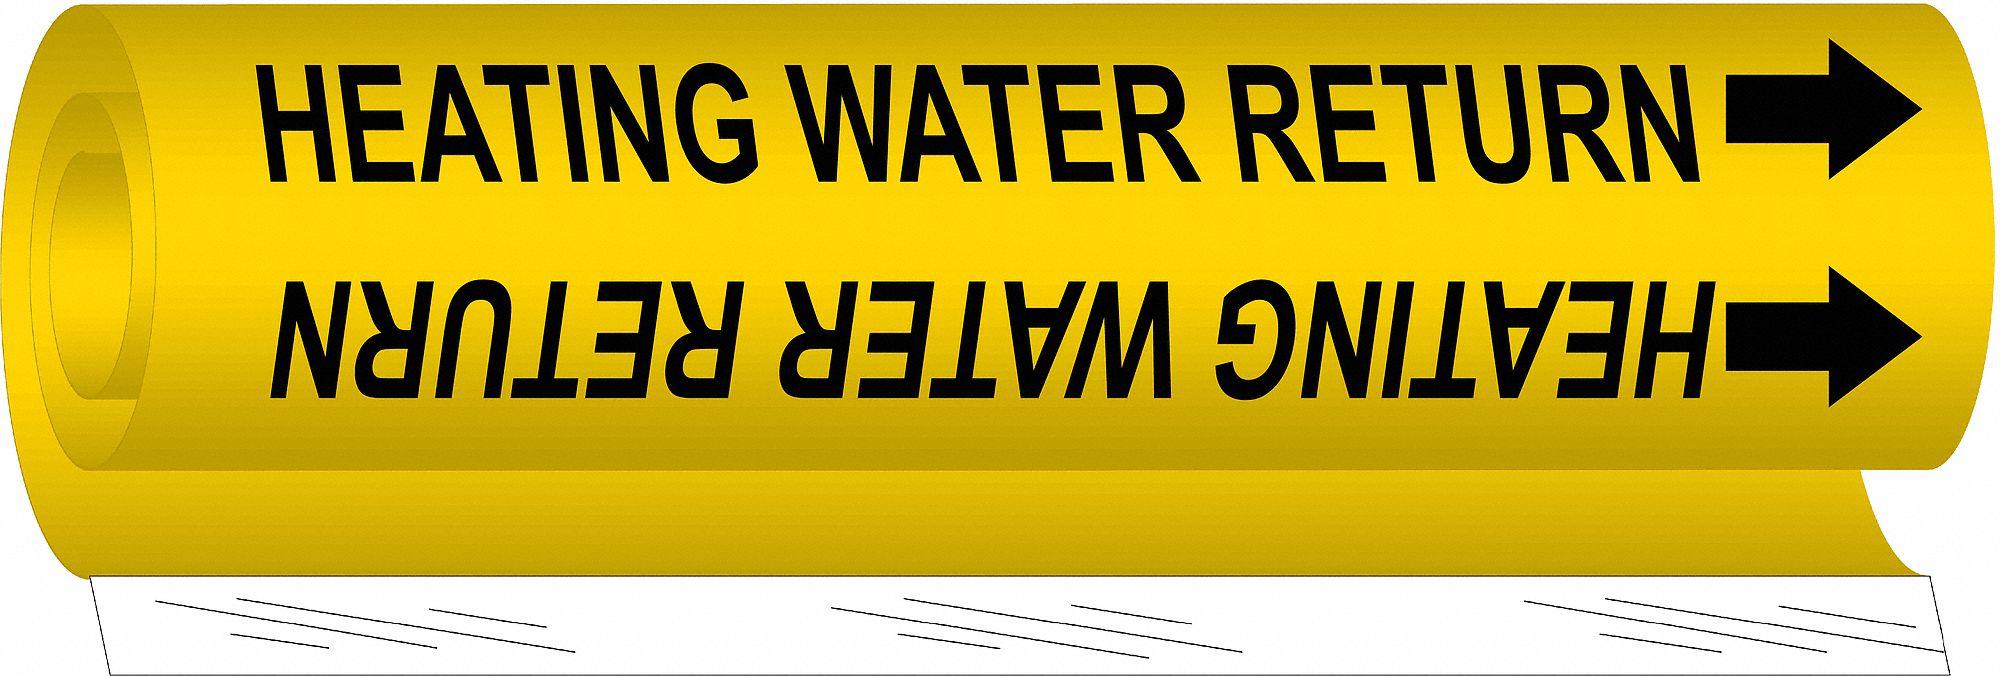 LegendHeating Water Return Wrap Around Pipe Marker Brady 5702-Ii High Performance